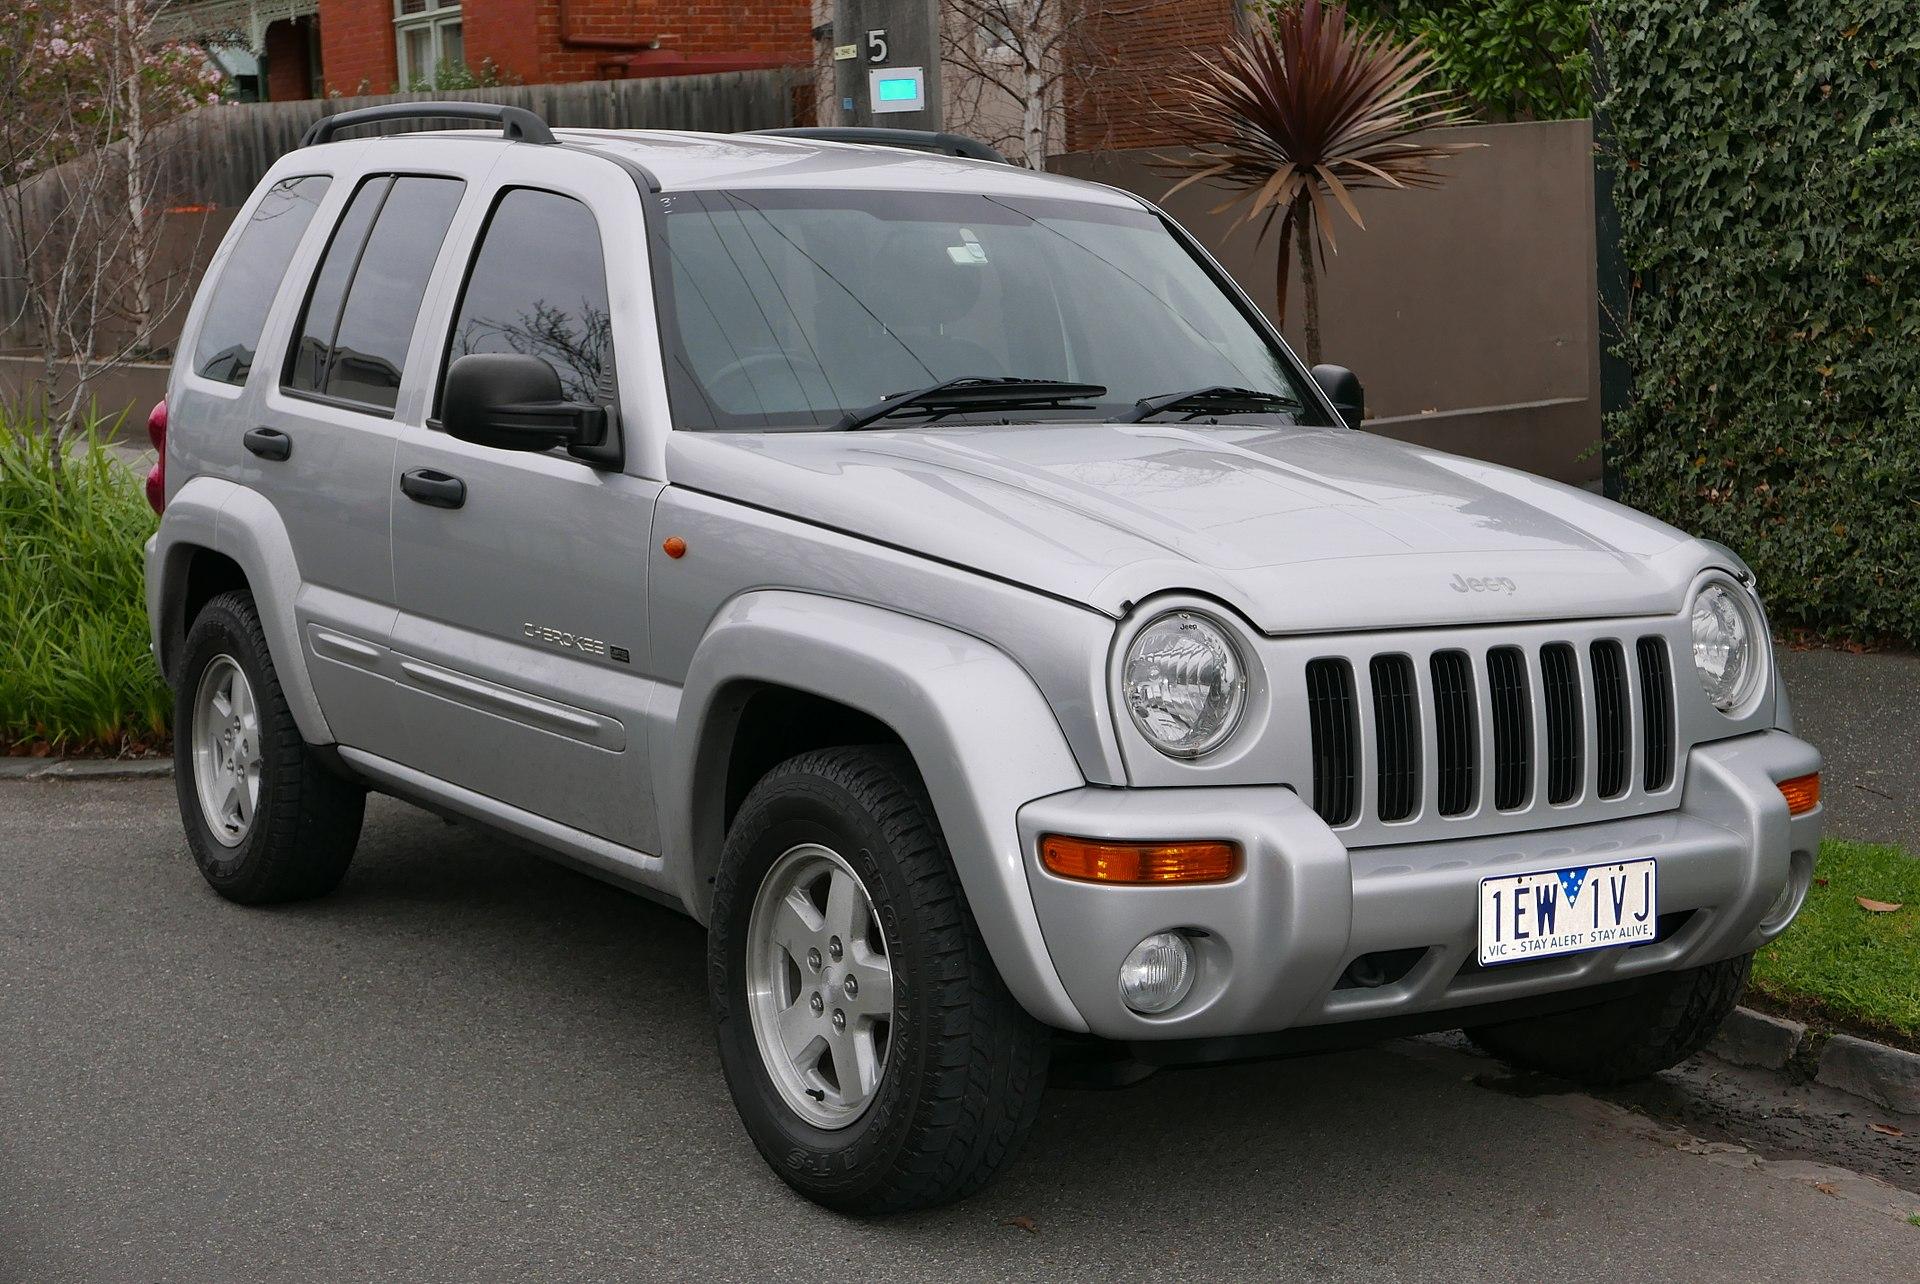 Jeep liberty kj wikipedia for 2003 jeep liberty motor oil